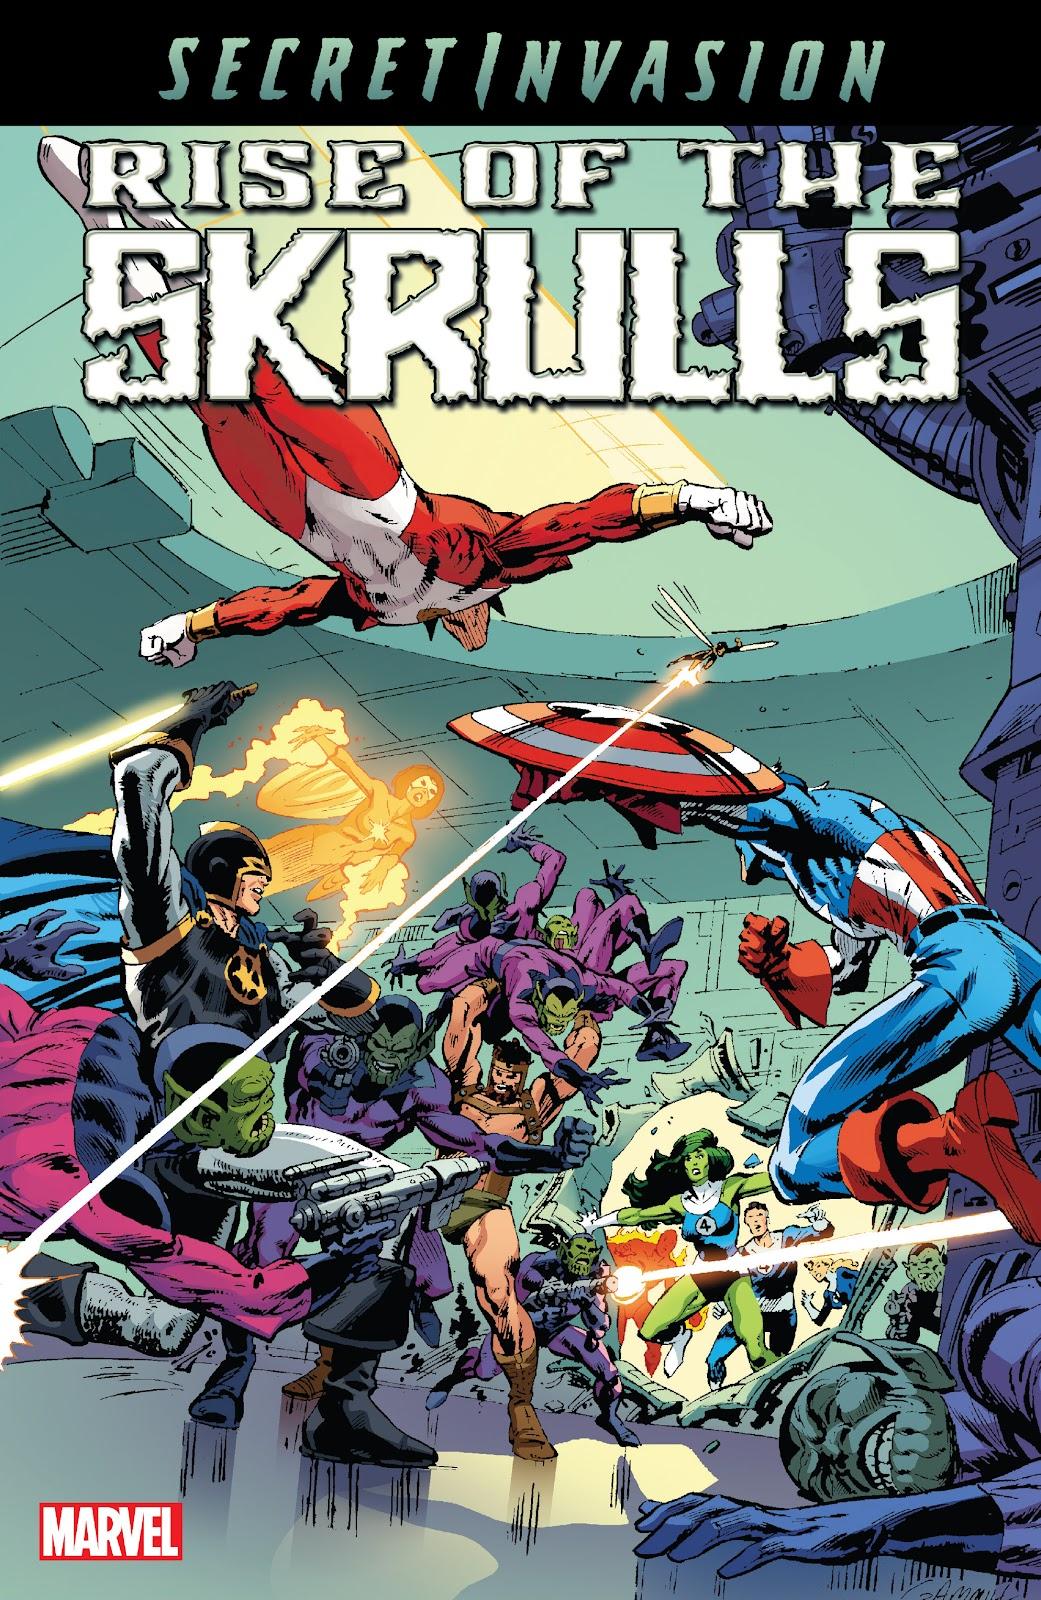 Read online Secret Invasion: Rise of the Skrulls comic -  Issue # TPB (Part 1) - 1